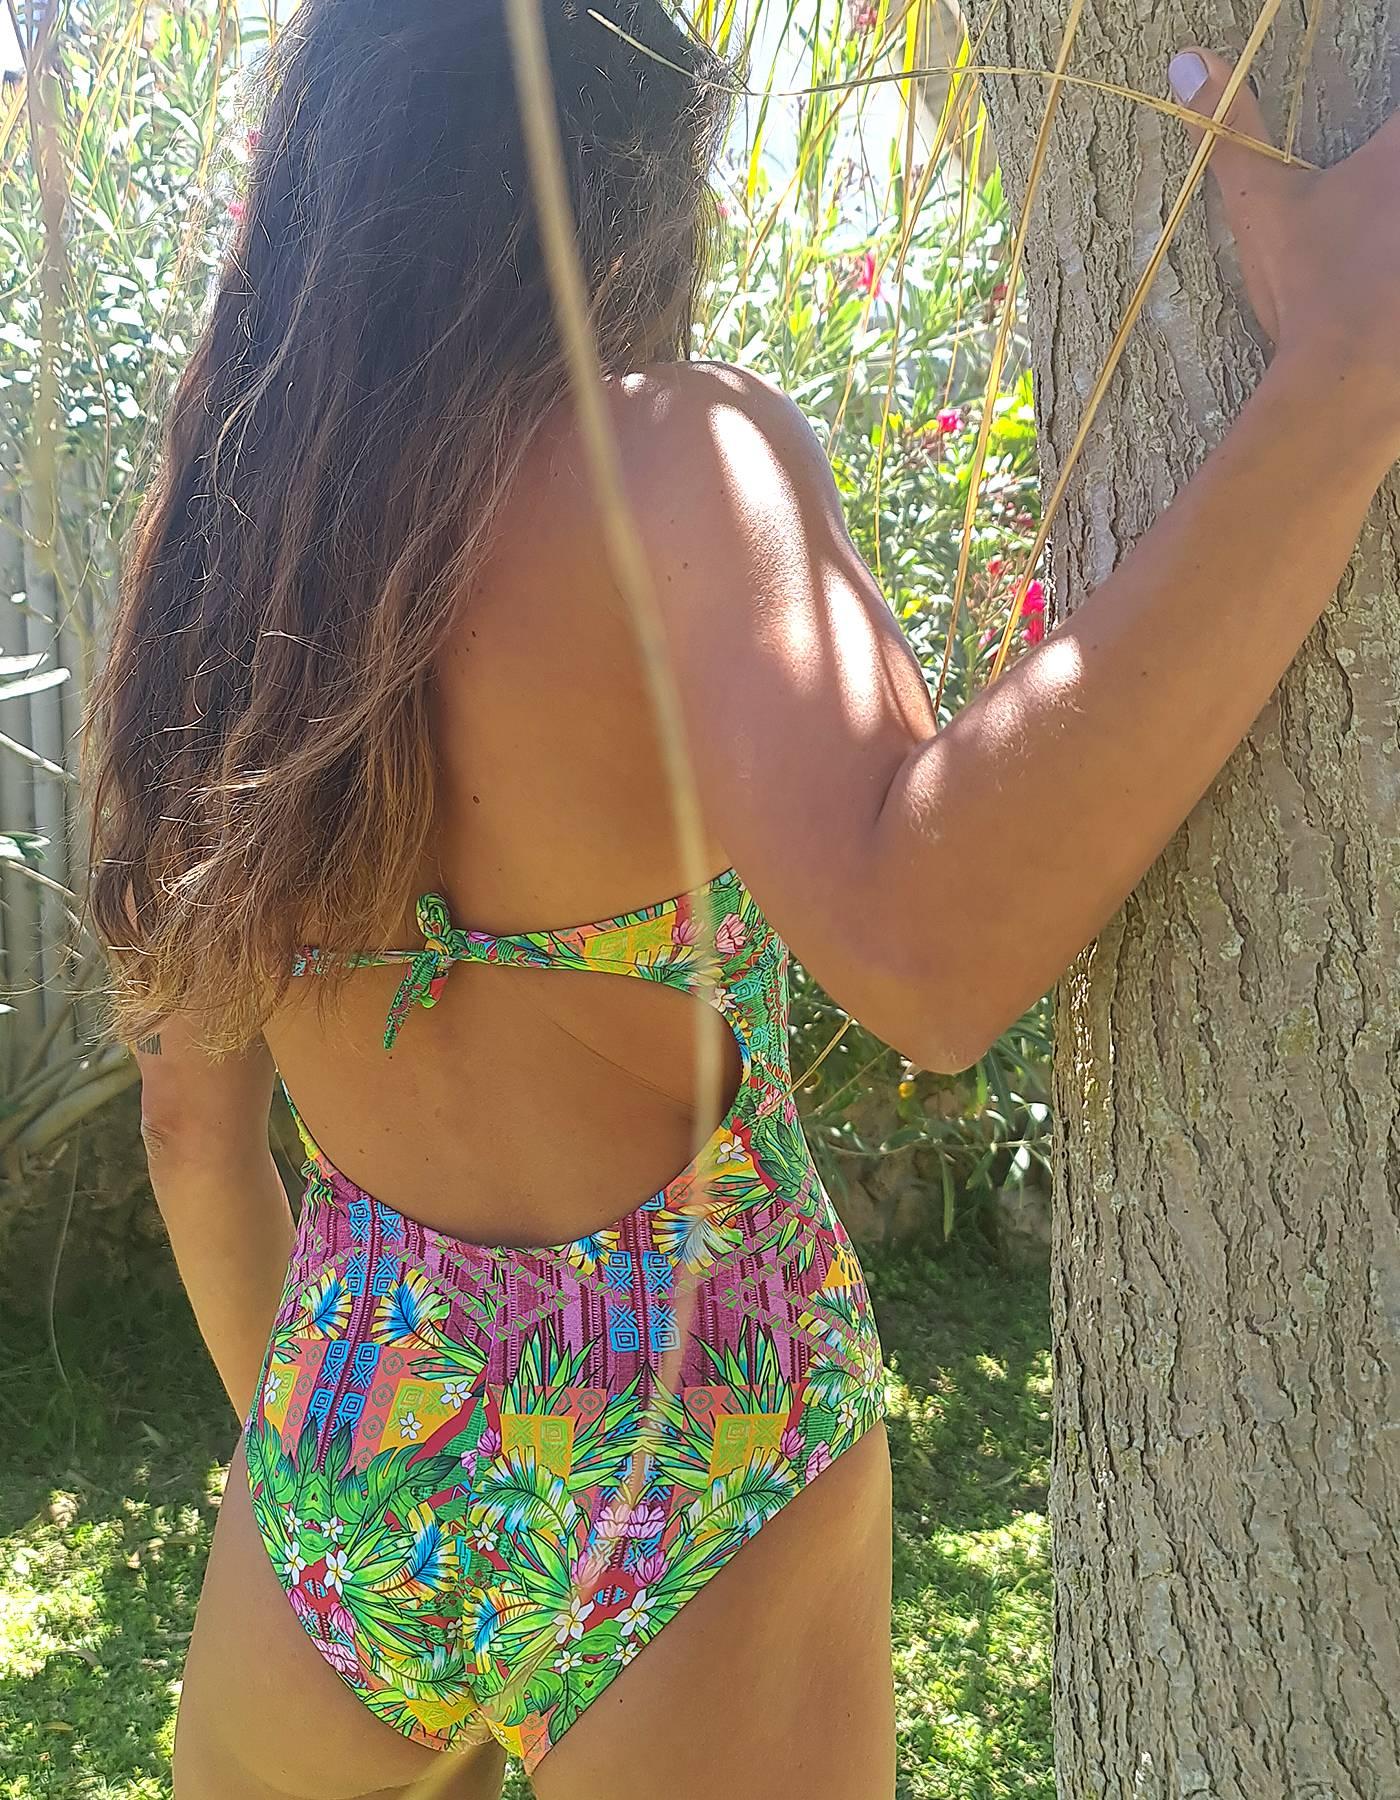 Bañador tropical copa suave ajustable broches-6027MAIOESTAMPADO68E-B